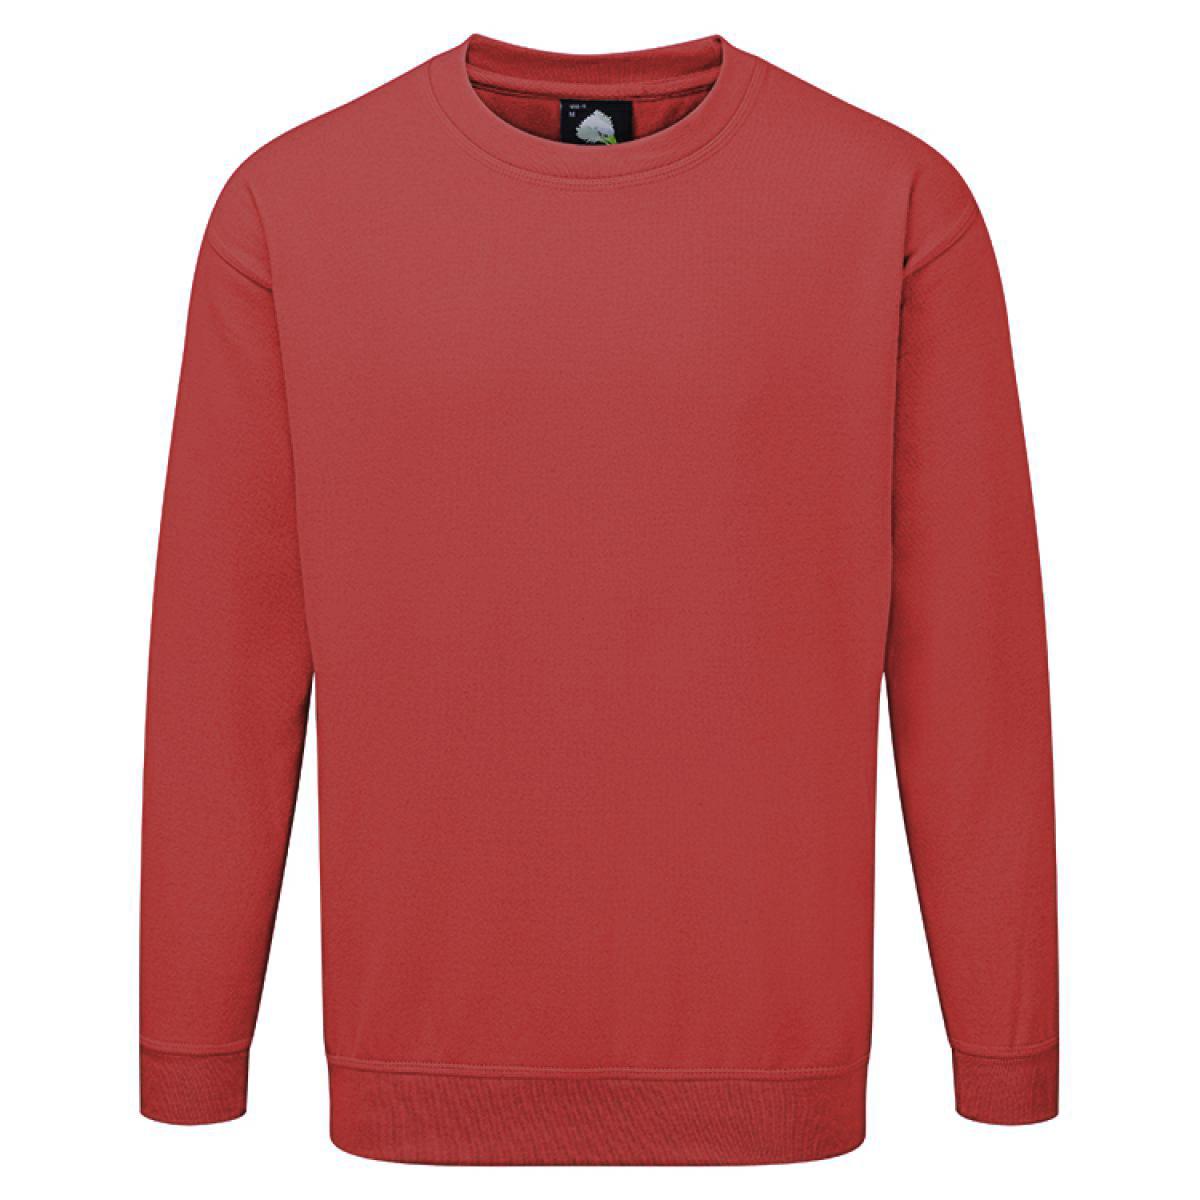 2619cfef85b6 Kite Premium Sweatshirt Quality Workwear at Affordable Prices